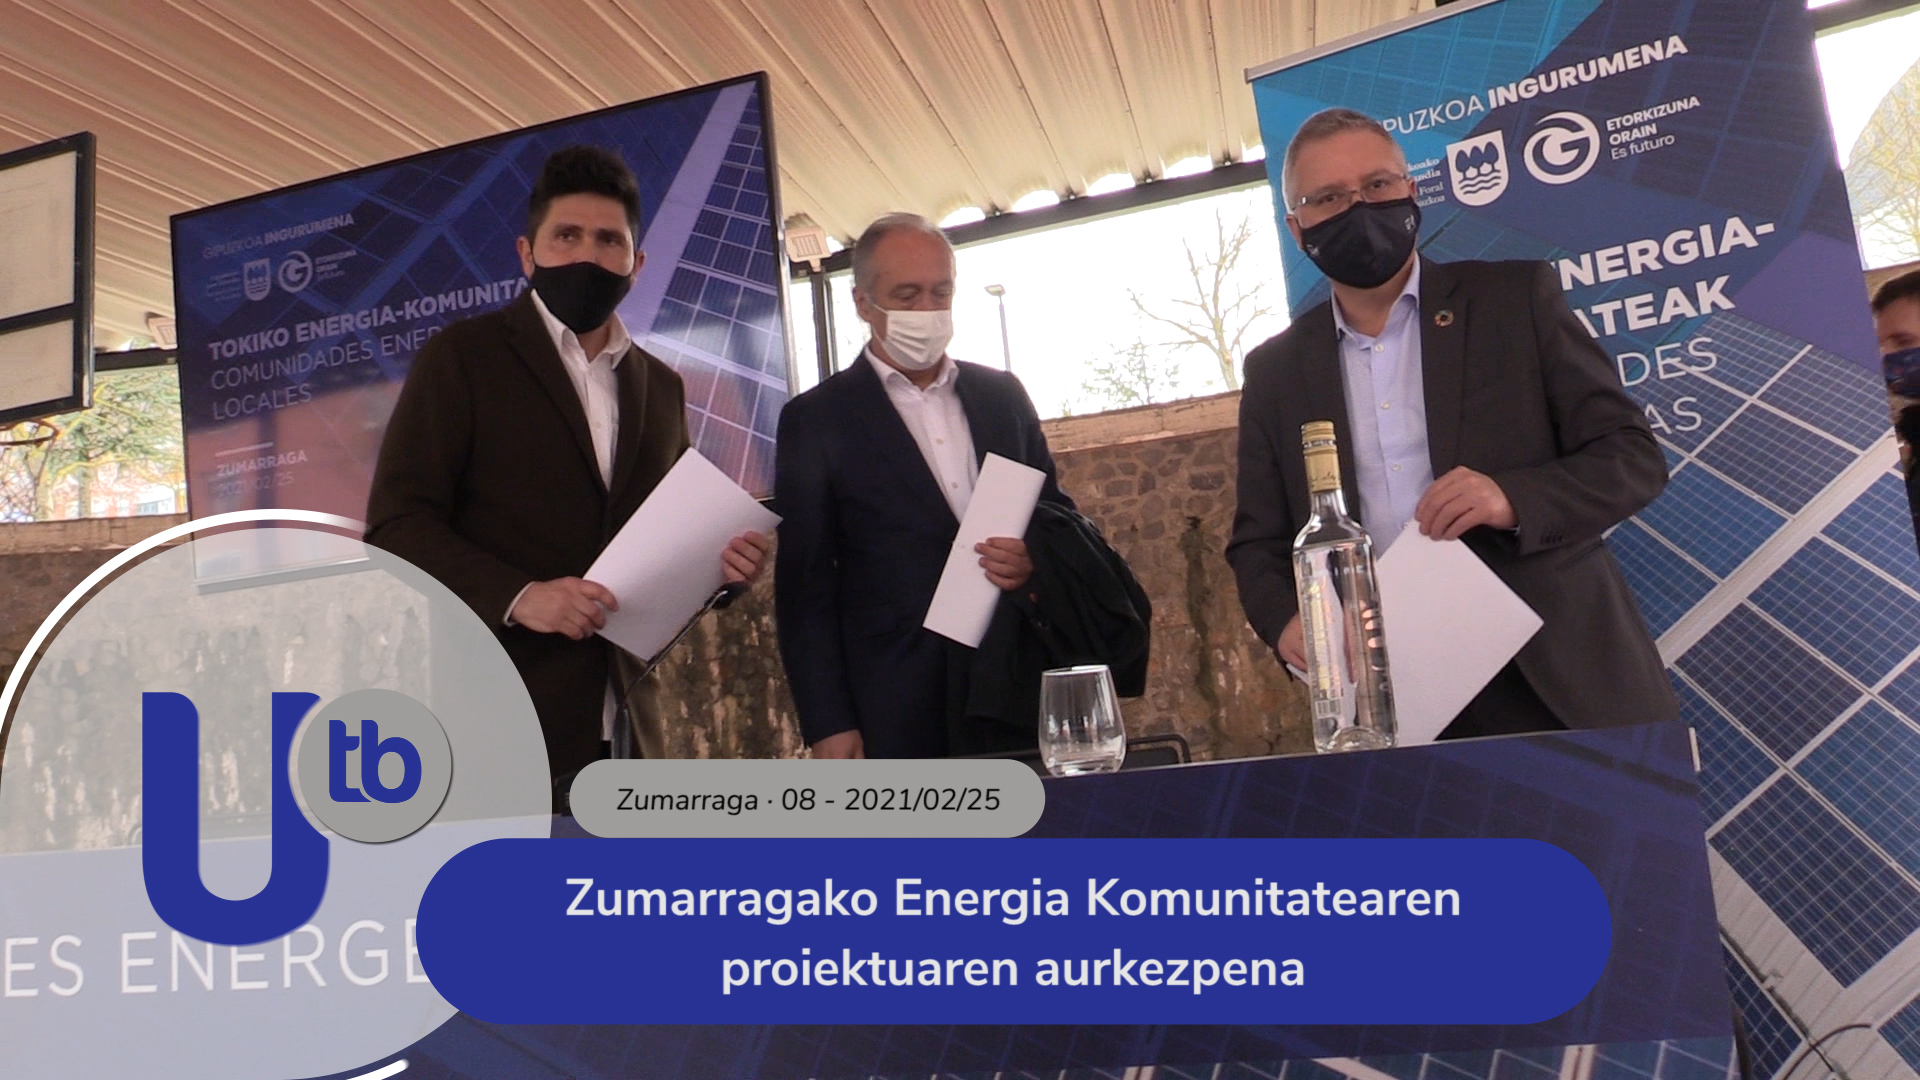 Zumarragako Energia Komunitatearen proiektuaren aurkezpena / Presentación del proyecto de Comunidad Energética de Zumarraga